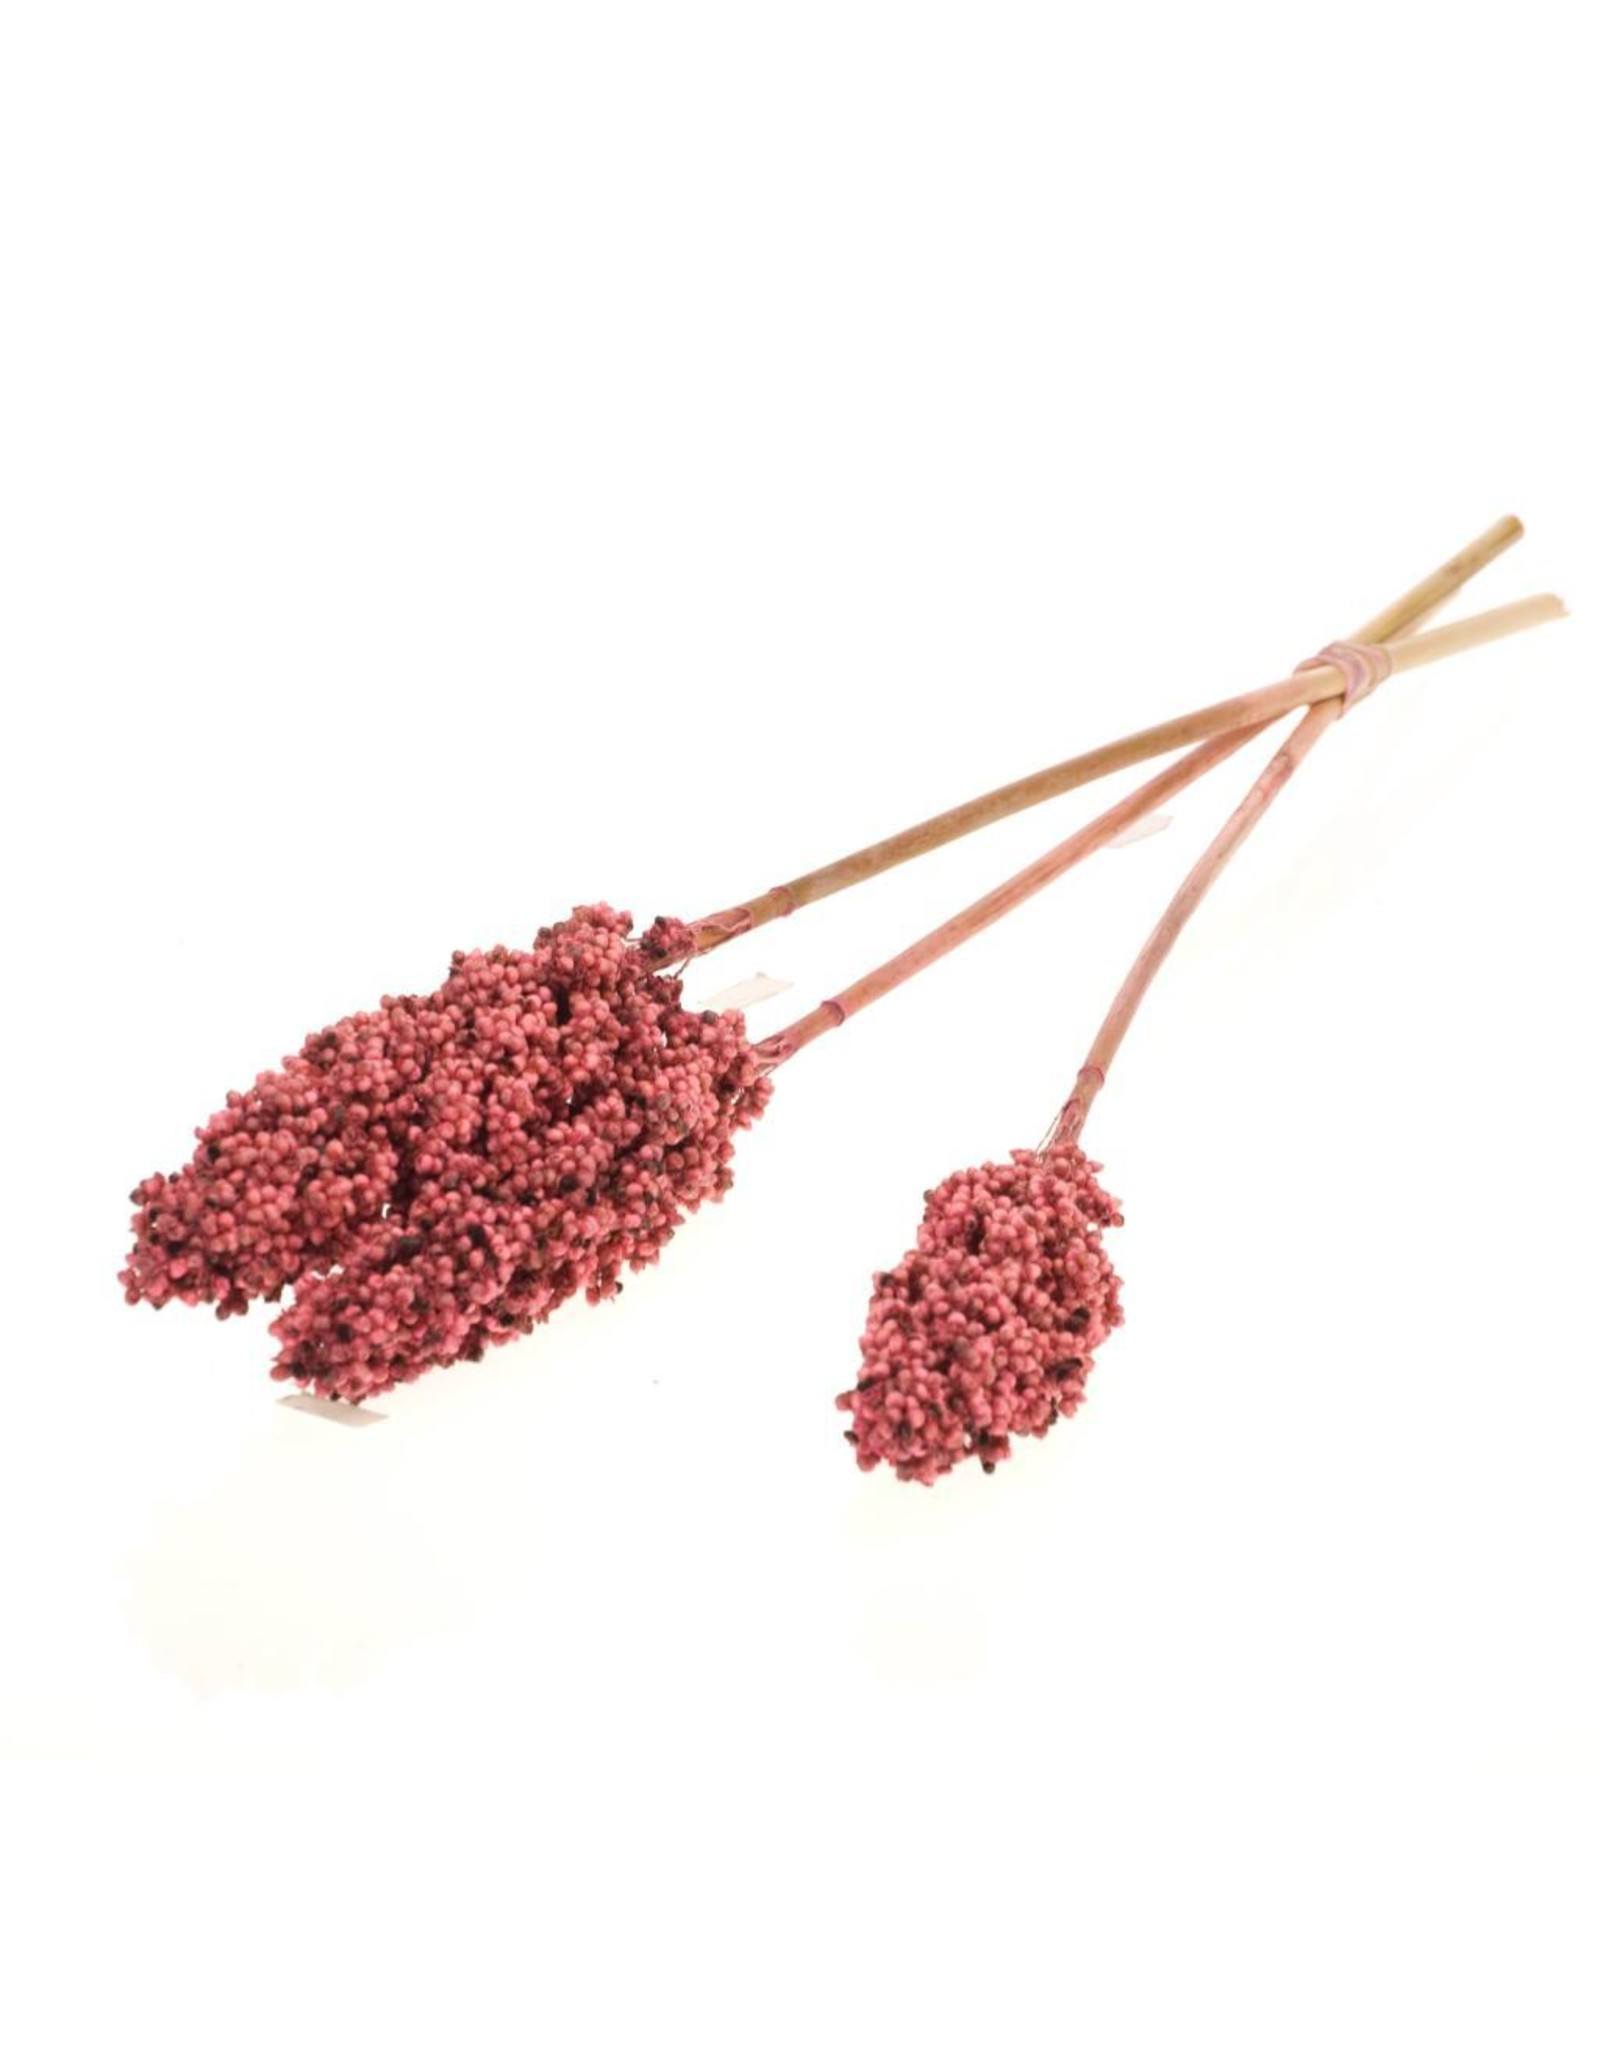 Indian corn 3pc bunch SB pink x 4